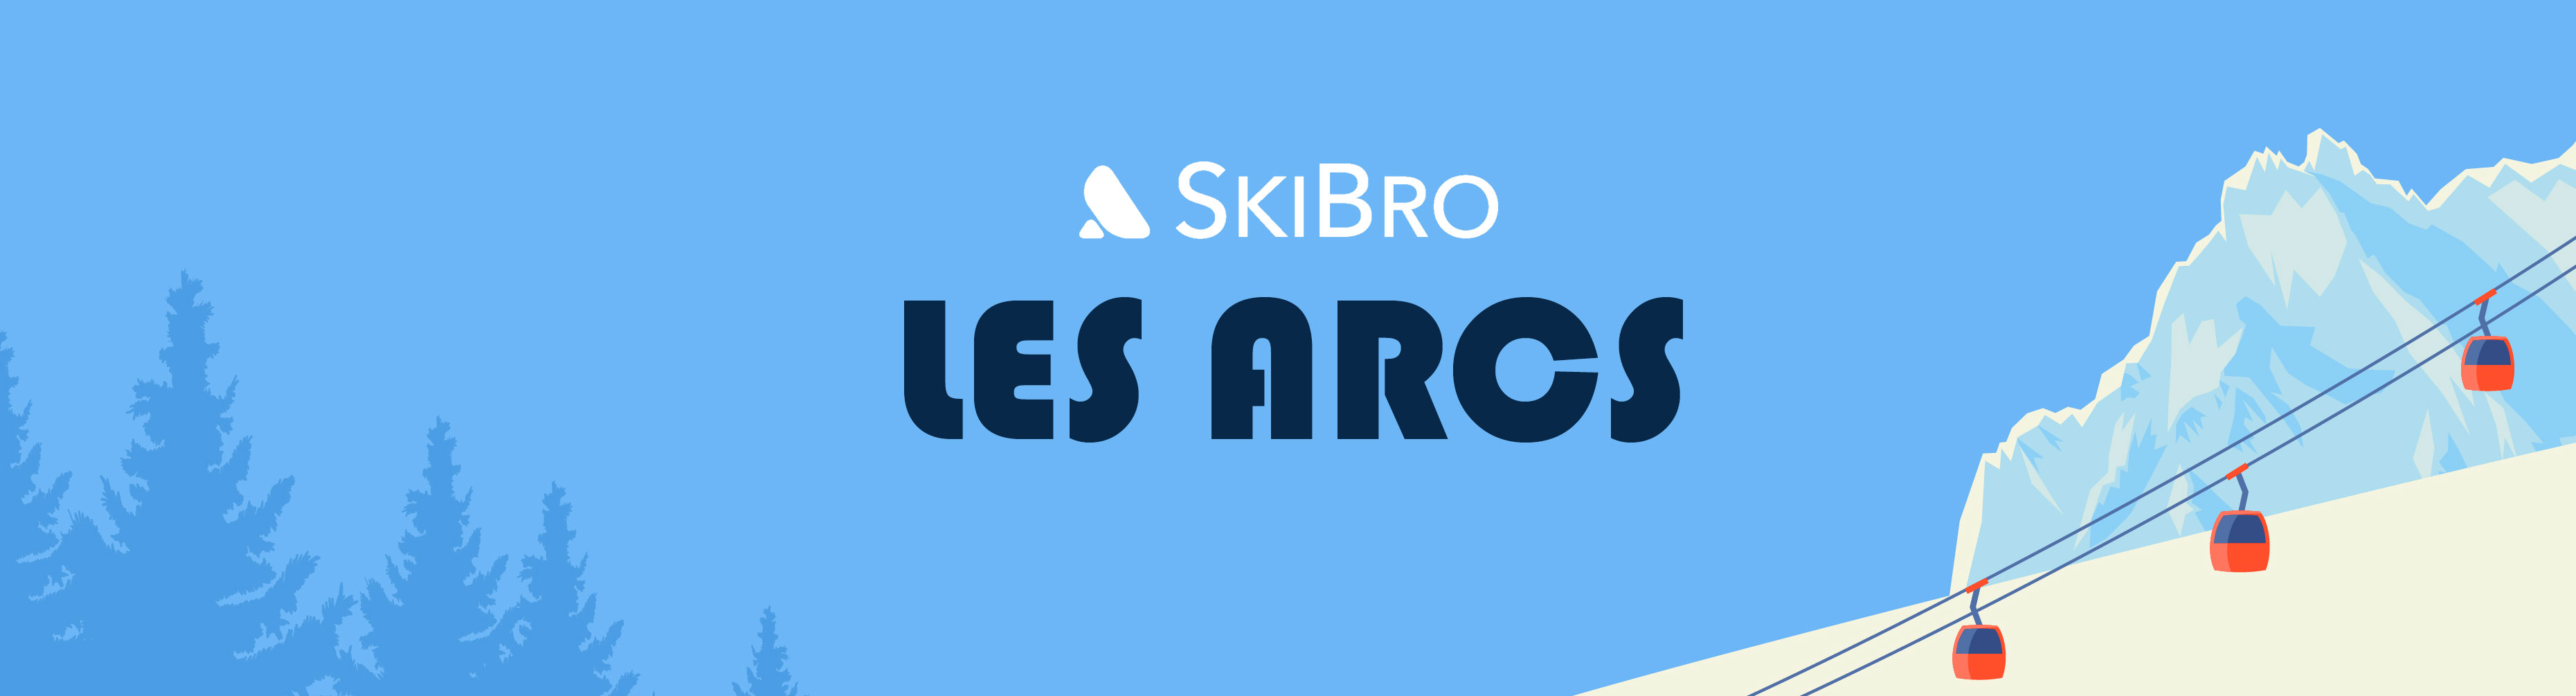 Skiing lesson Les Arcs